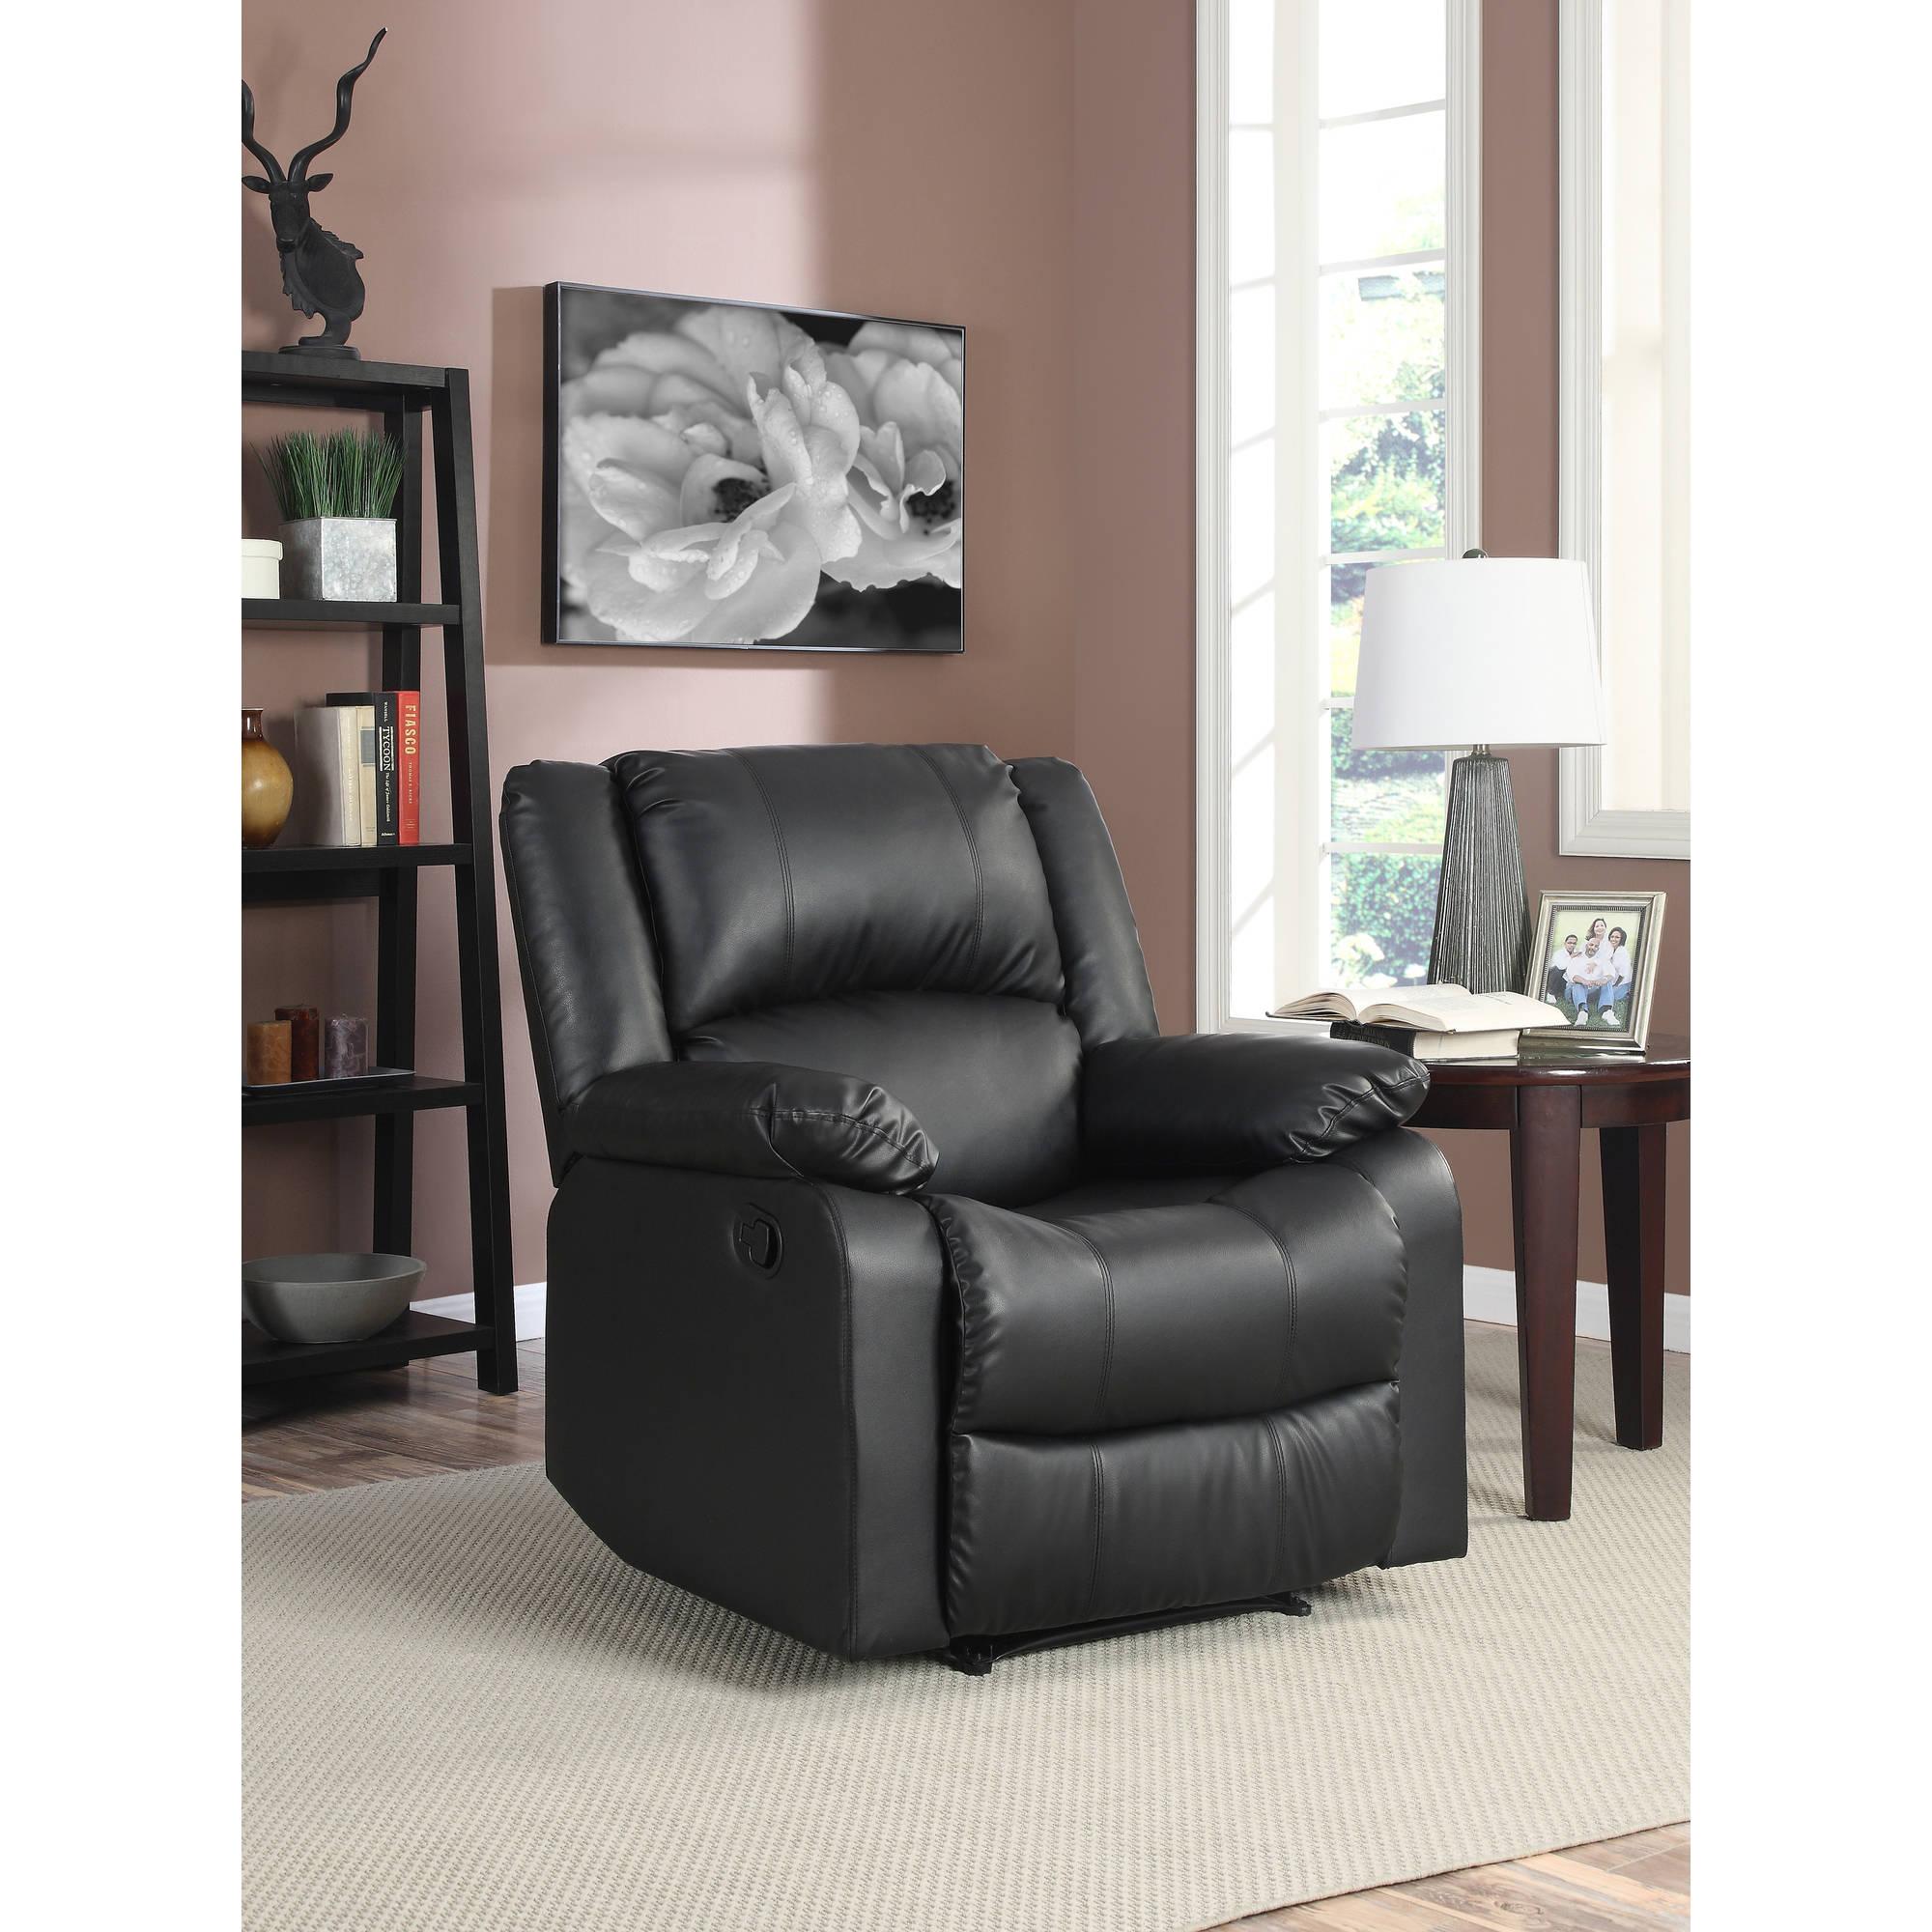 Serta Warren Recliner Single Chair